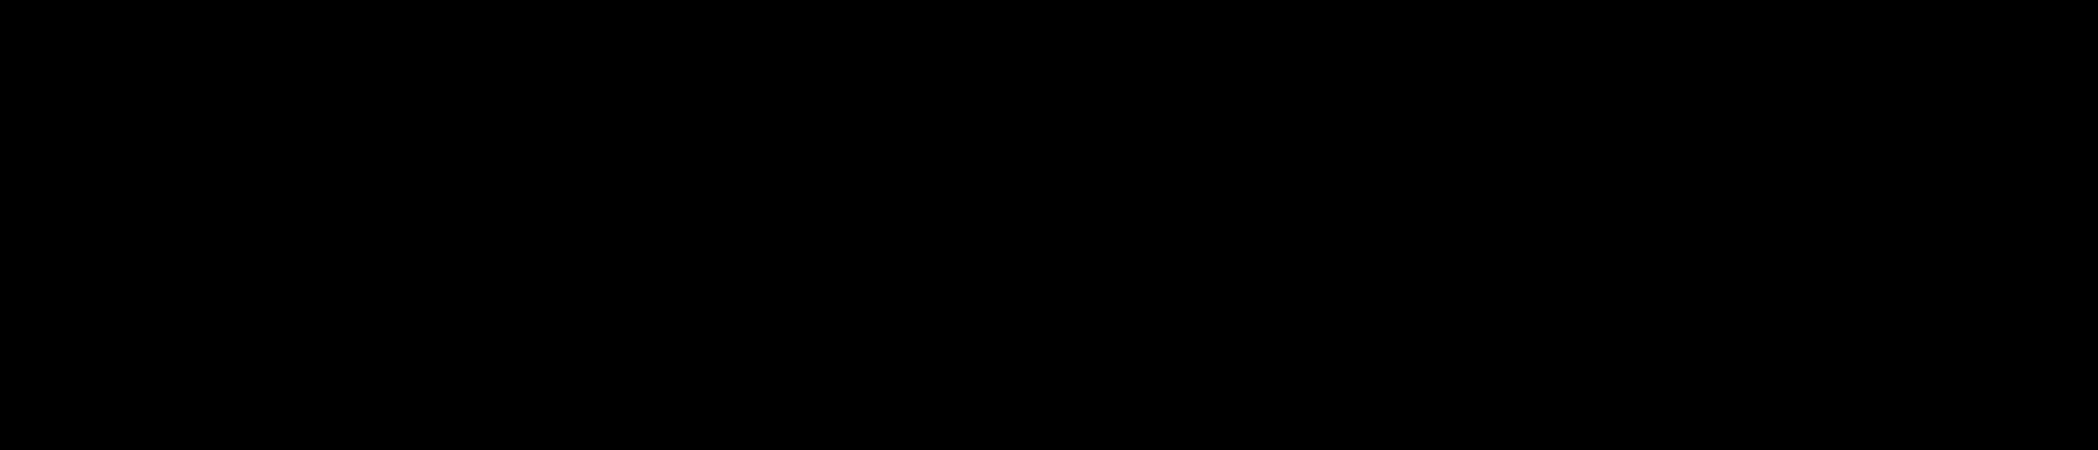 1,3-Bis(allylamino)-2-propanol Dihydrochloride-D5